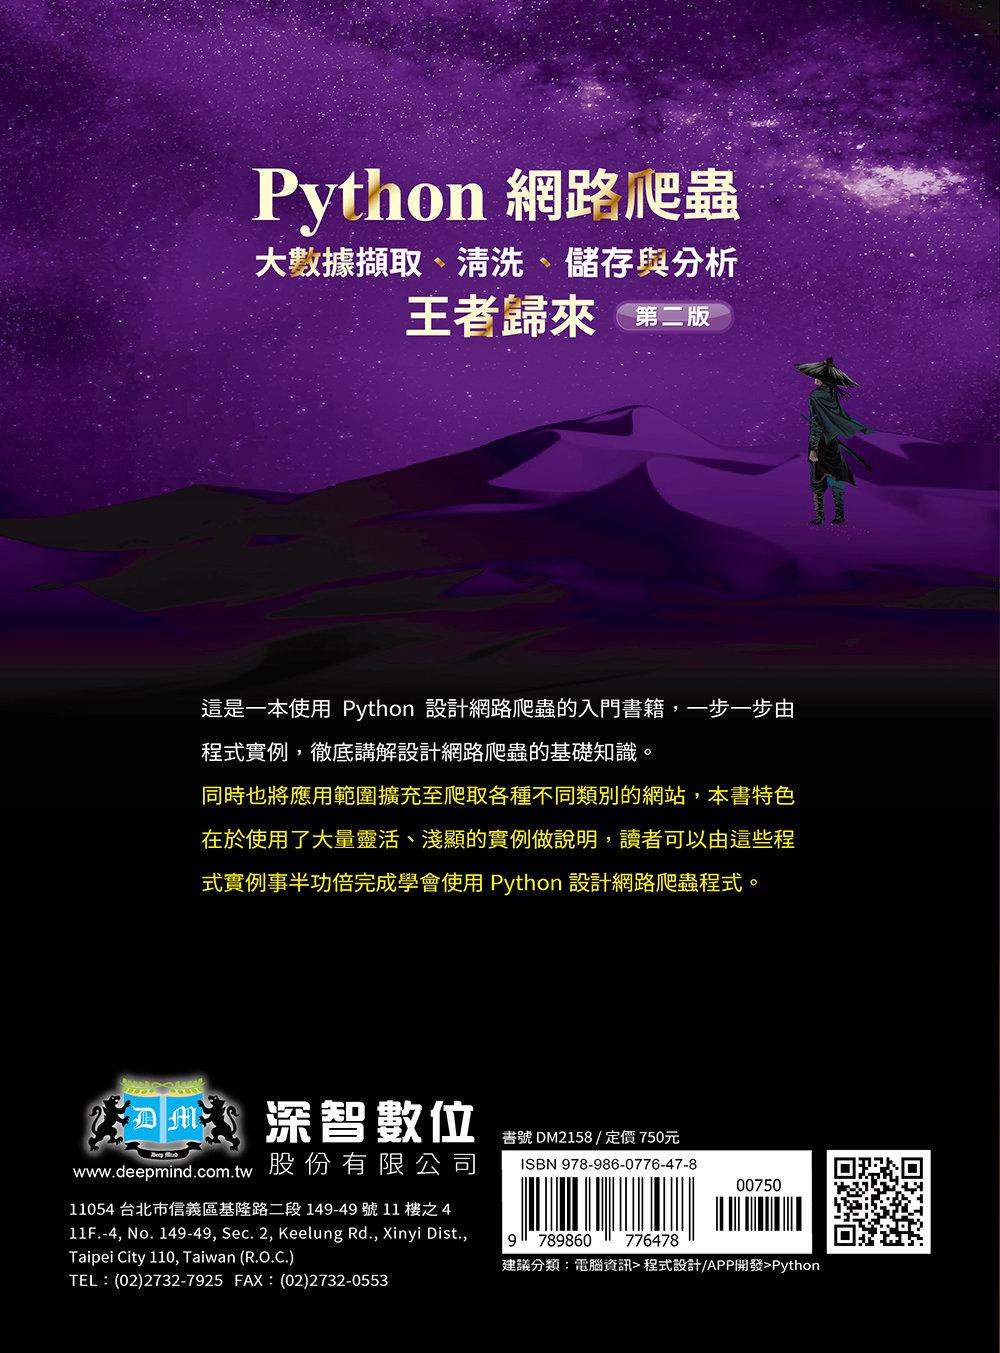 Python 網路爬蟲:大數據擷取、清洗、儲存與分析 王者歸來 (第二版)-preview-14